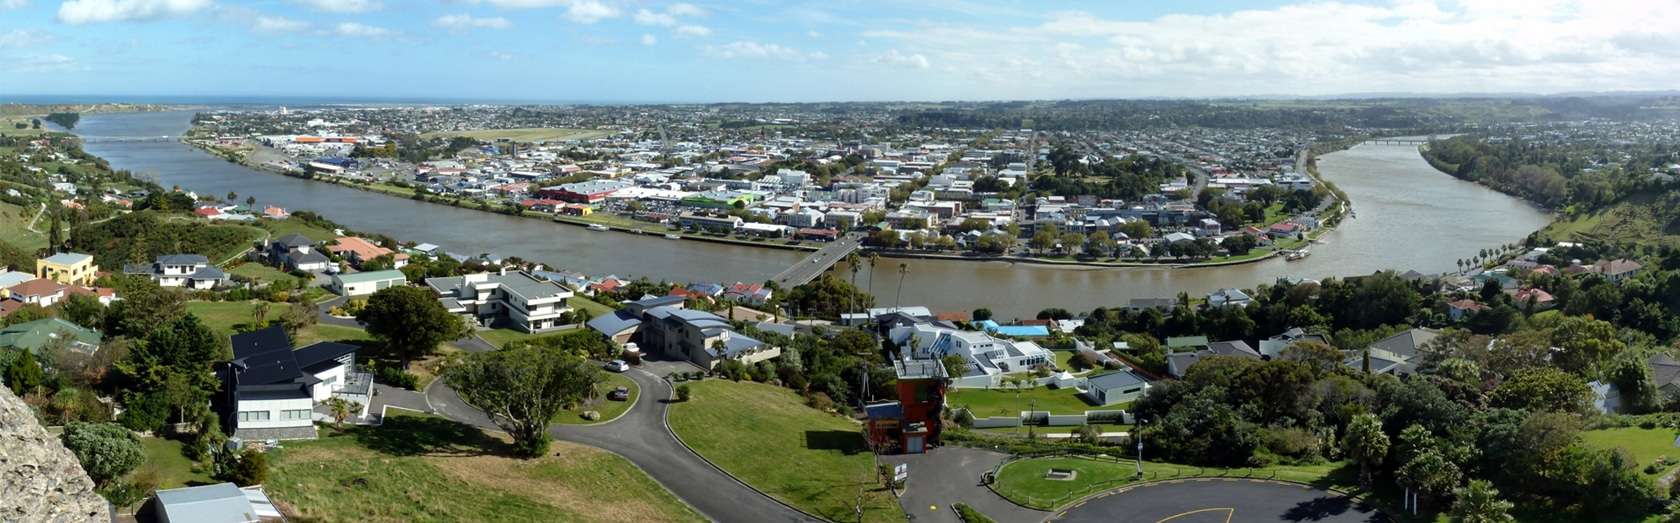 Wanganui city slider